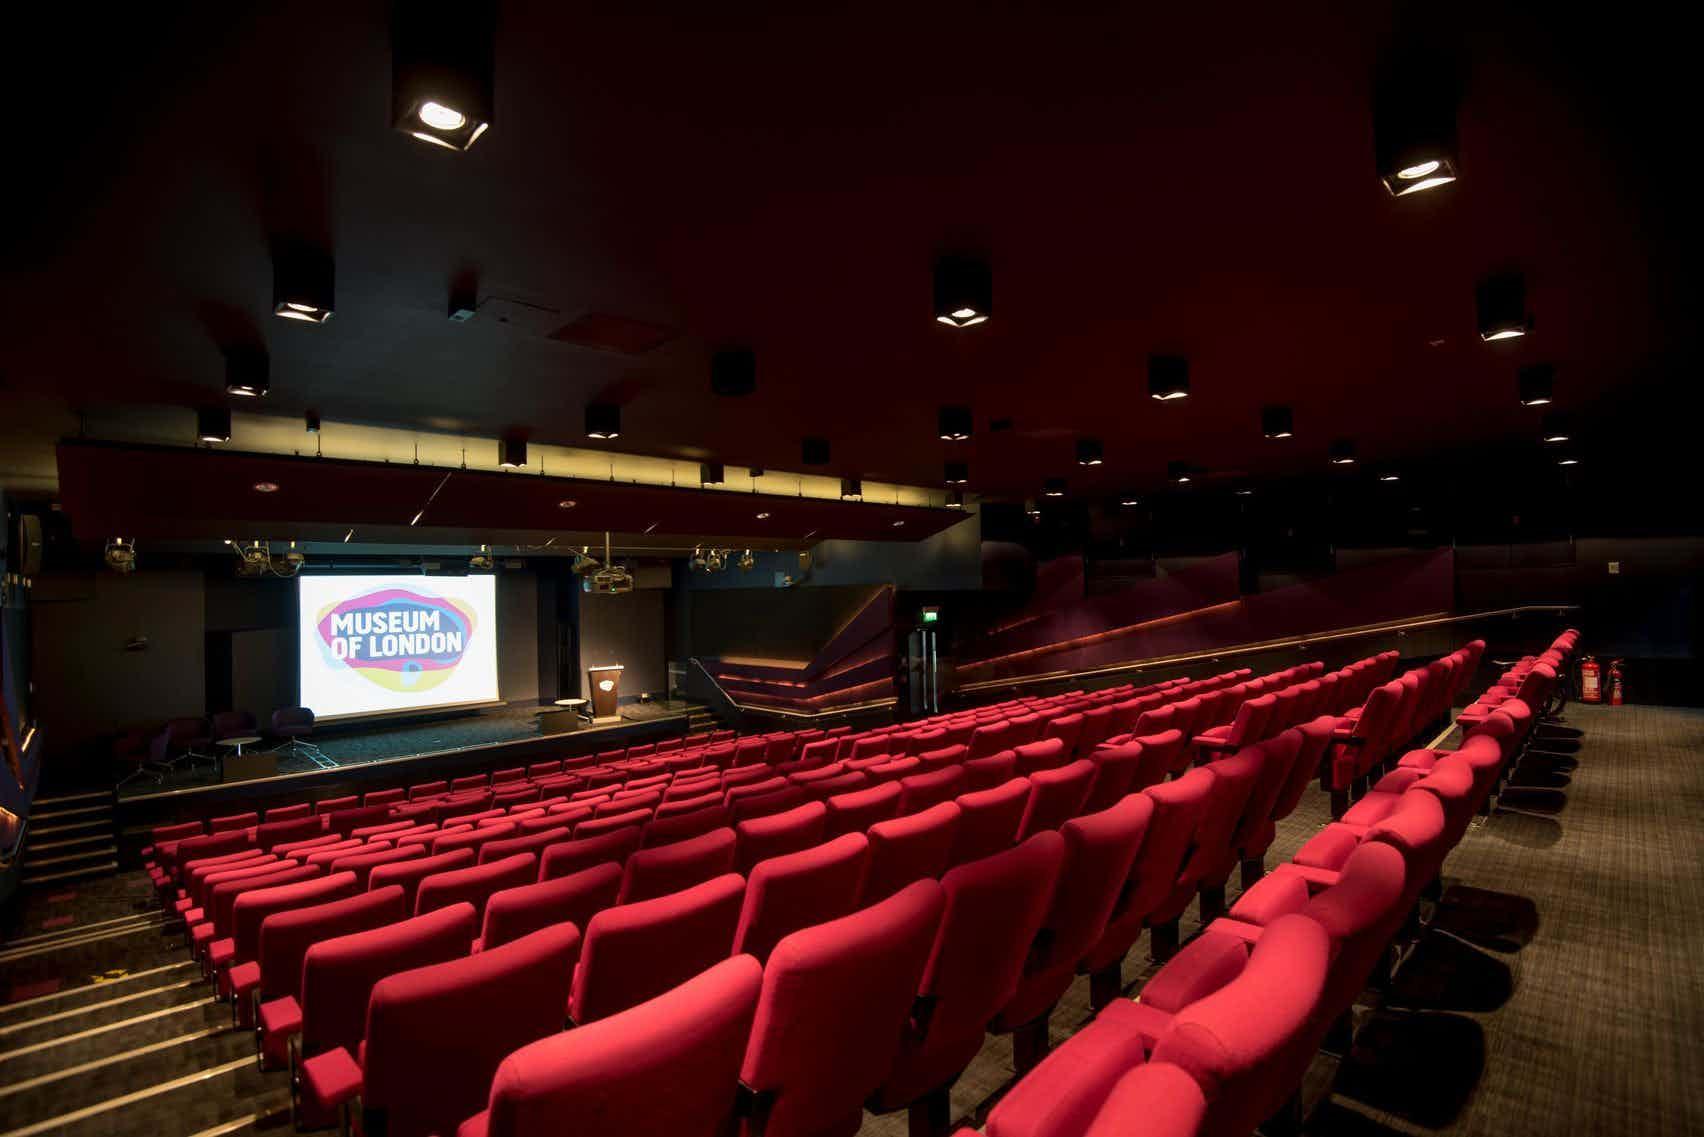 Weston Theatre, Museum of London